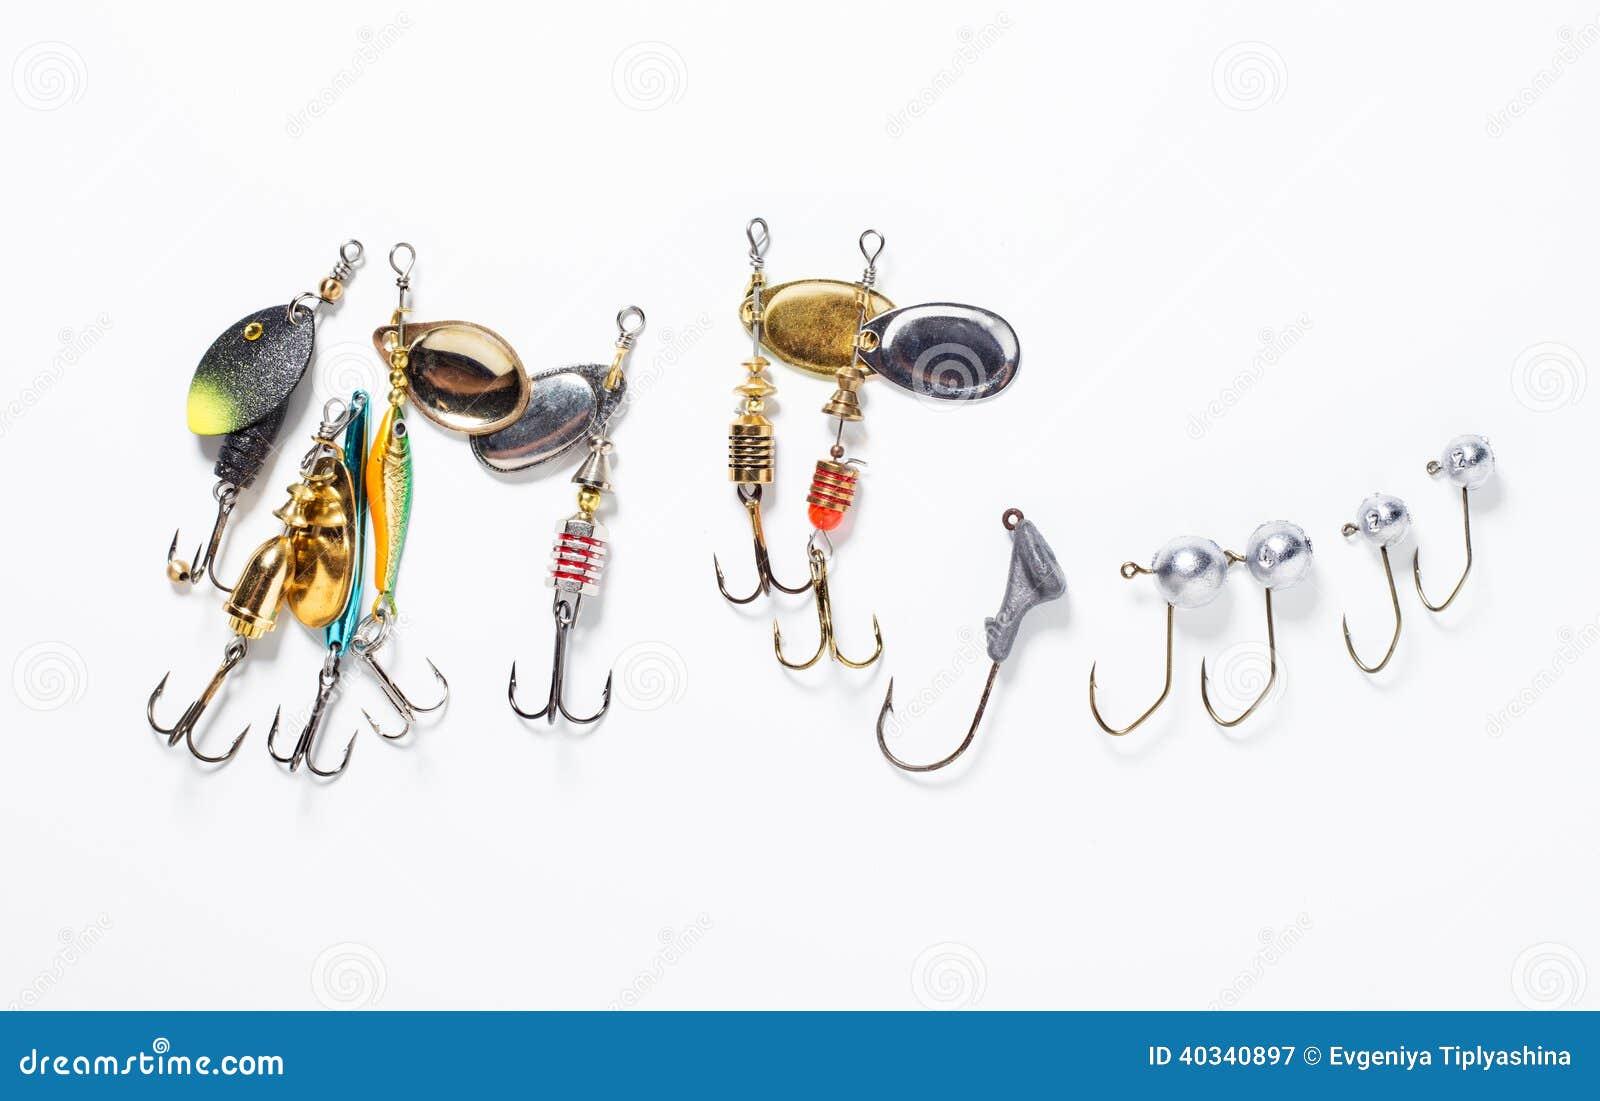 Ganchos de pesca con cebo